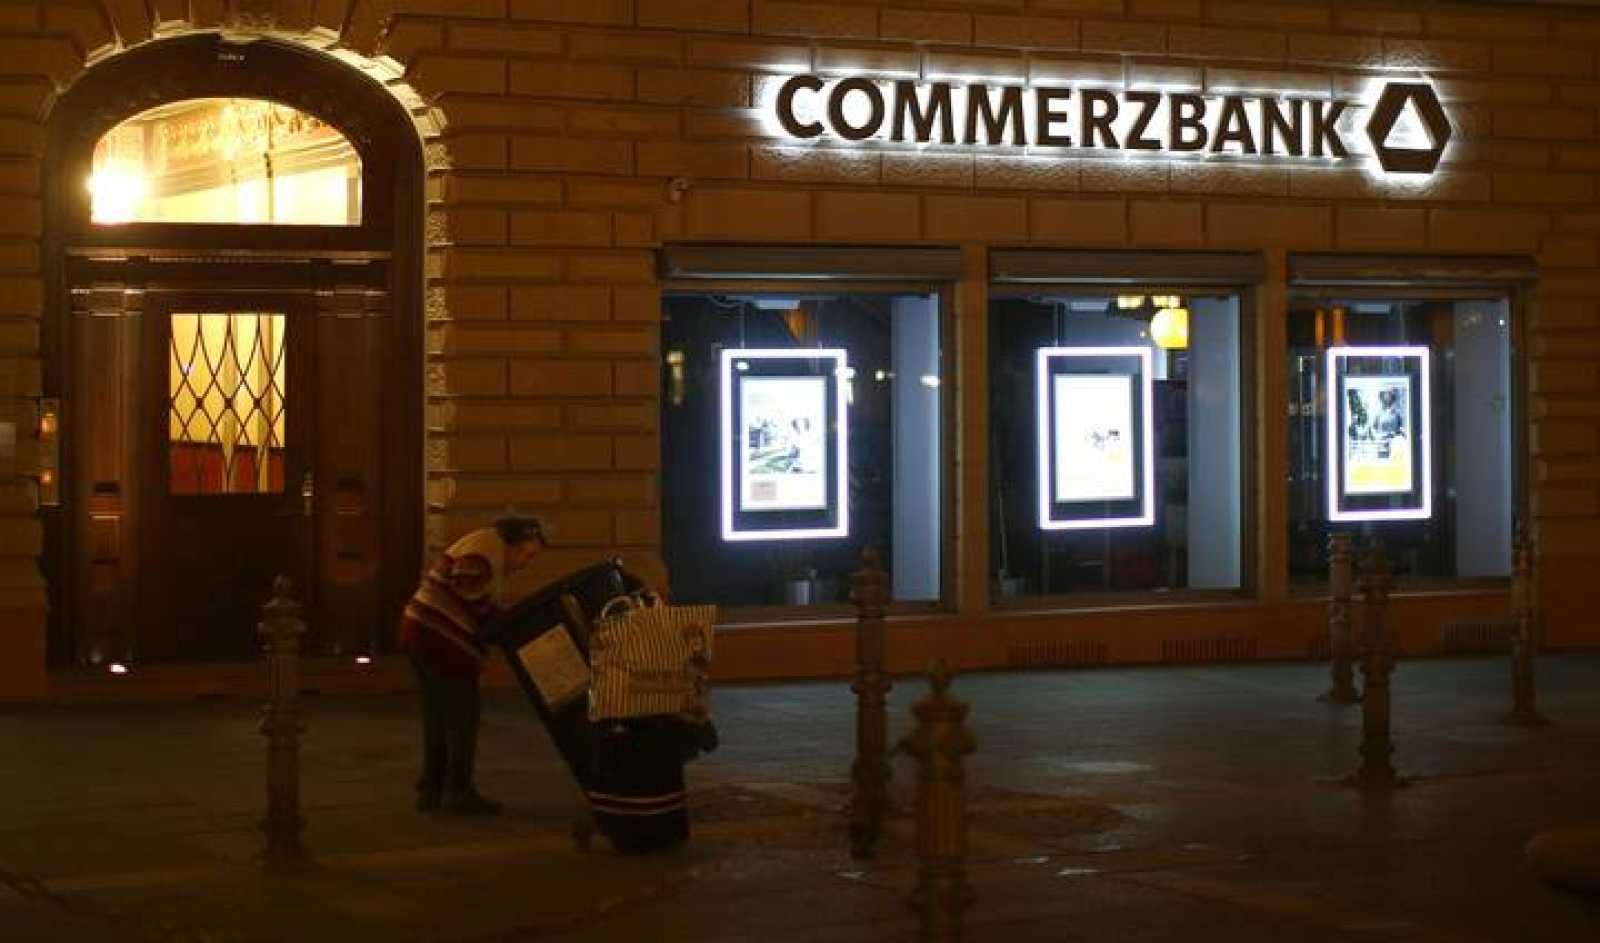 Sucursal de Commerzbank en Fráncfort